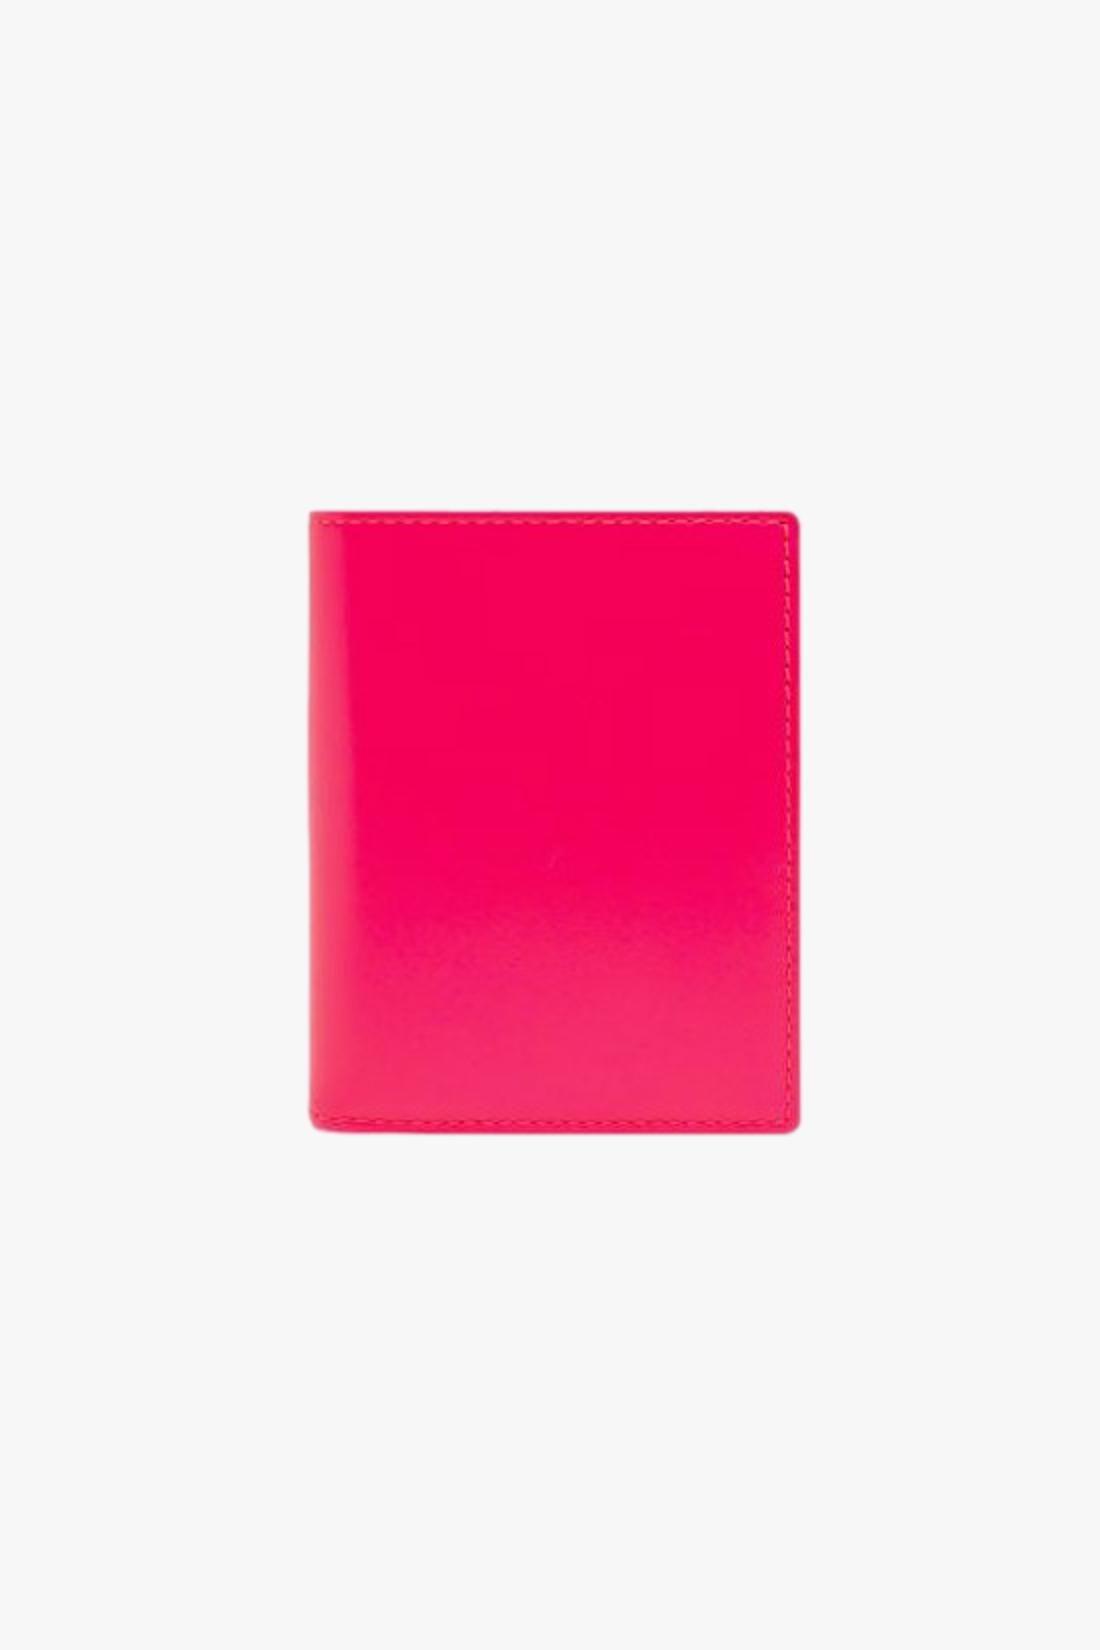 COMME DES GARÇONS WALLETS / Cdg super fluo sa0641sf Pink yellow